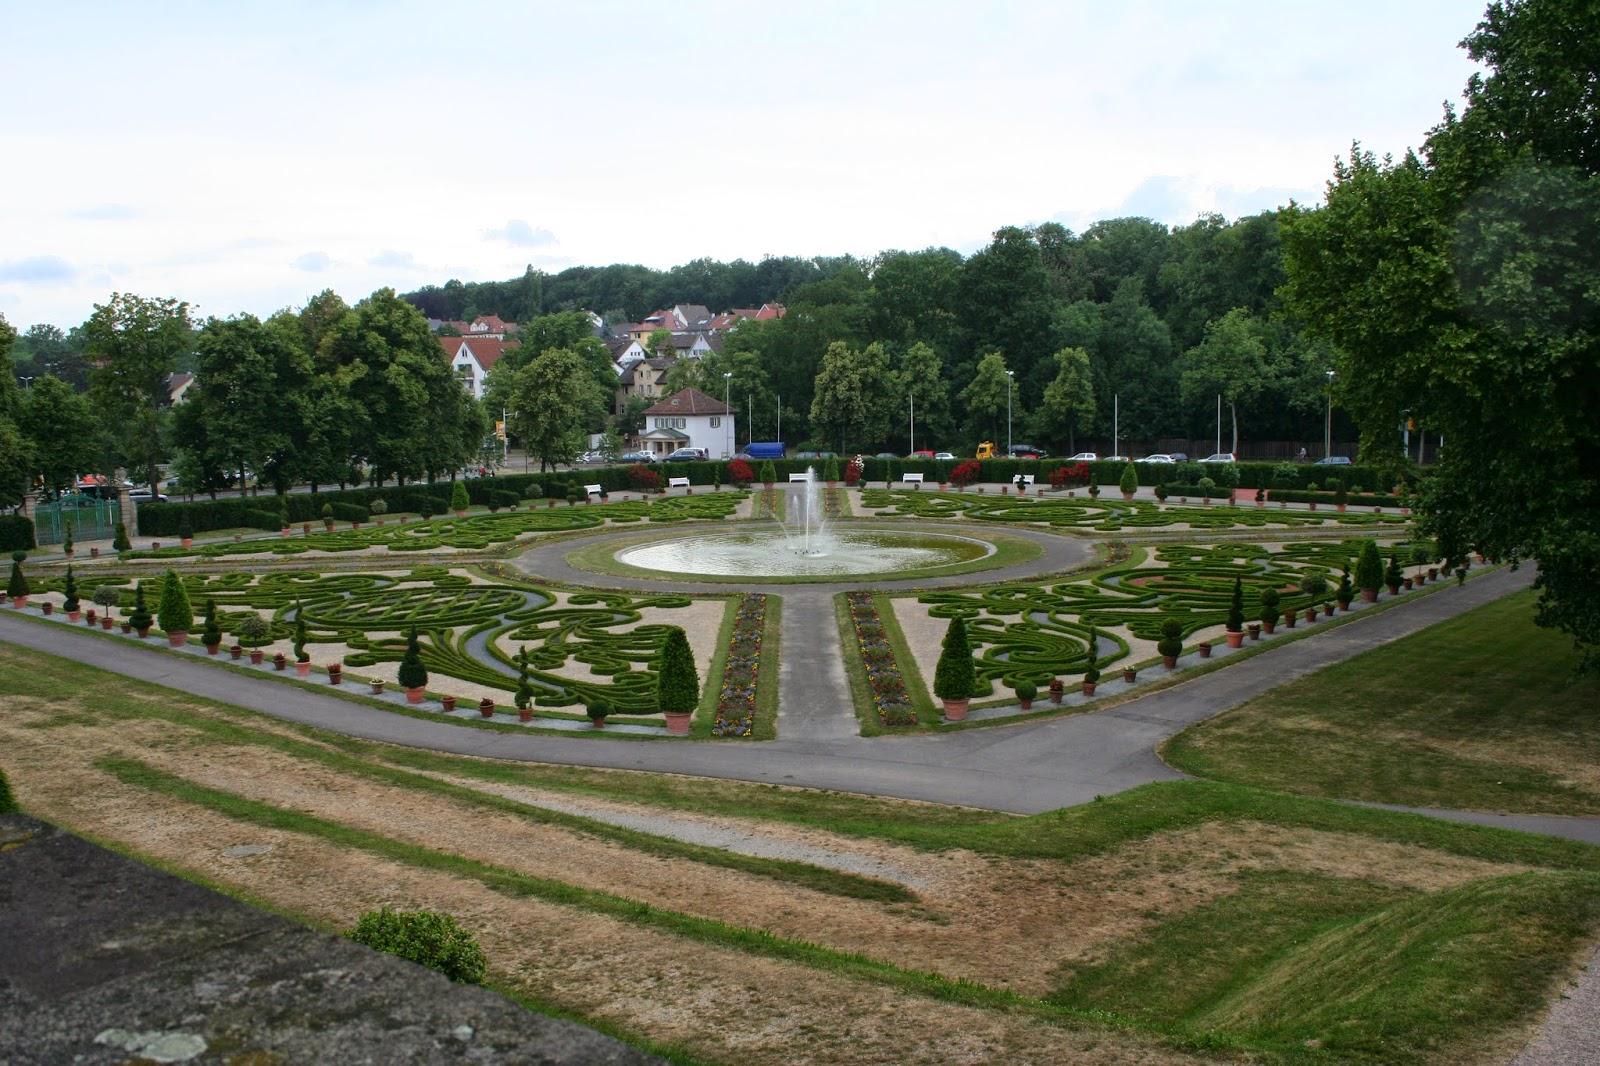 foto del Jardines del Residenzschloss de Ludwigsburg